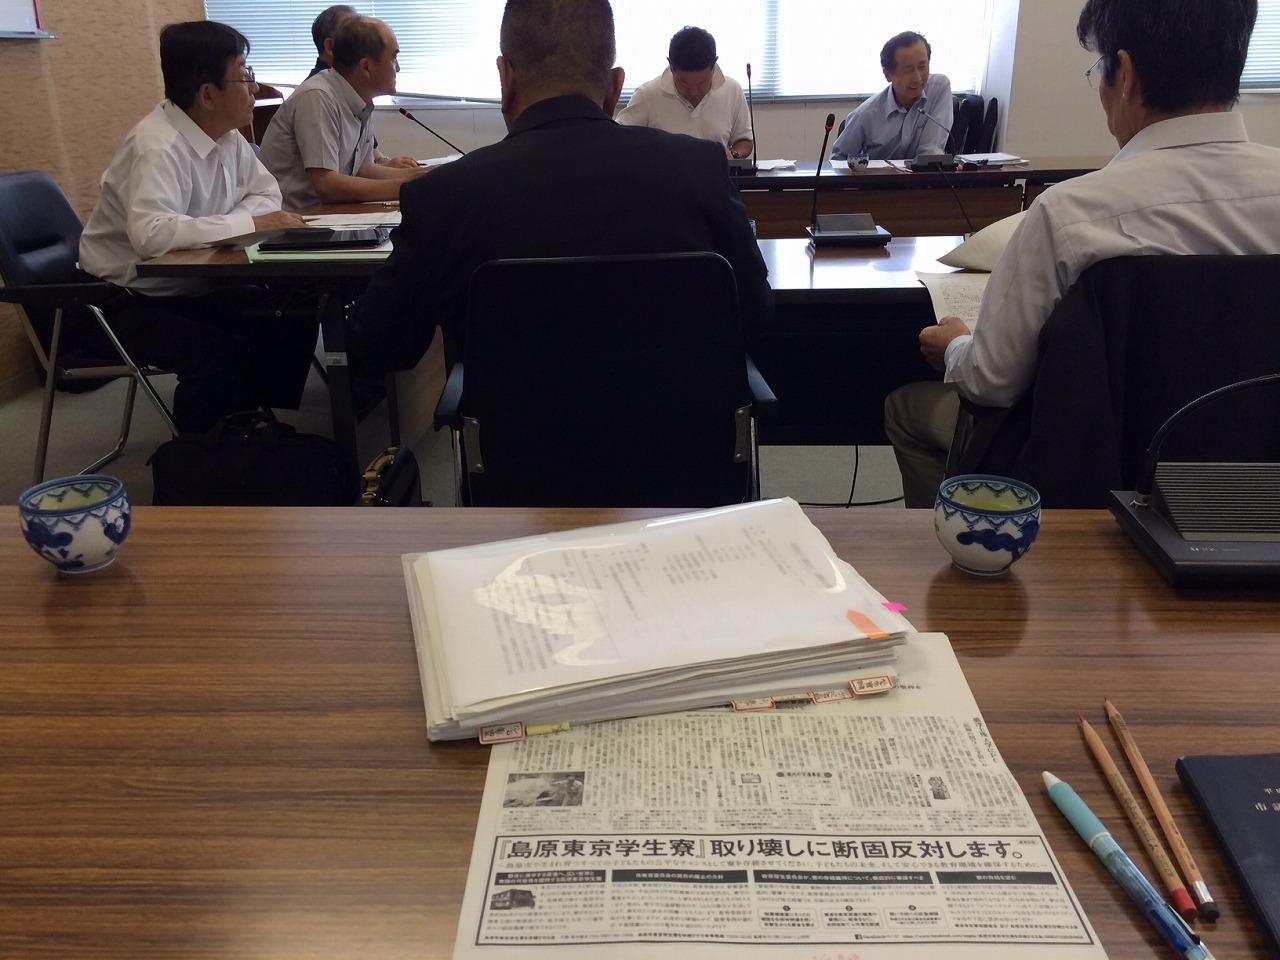 学生寮廃止へ_c0052876_18445248.jpg